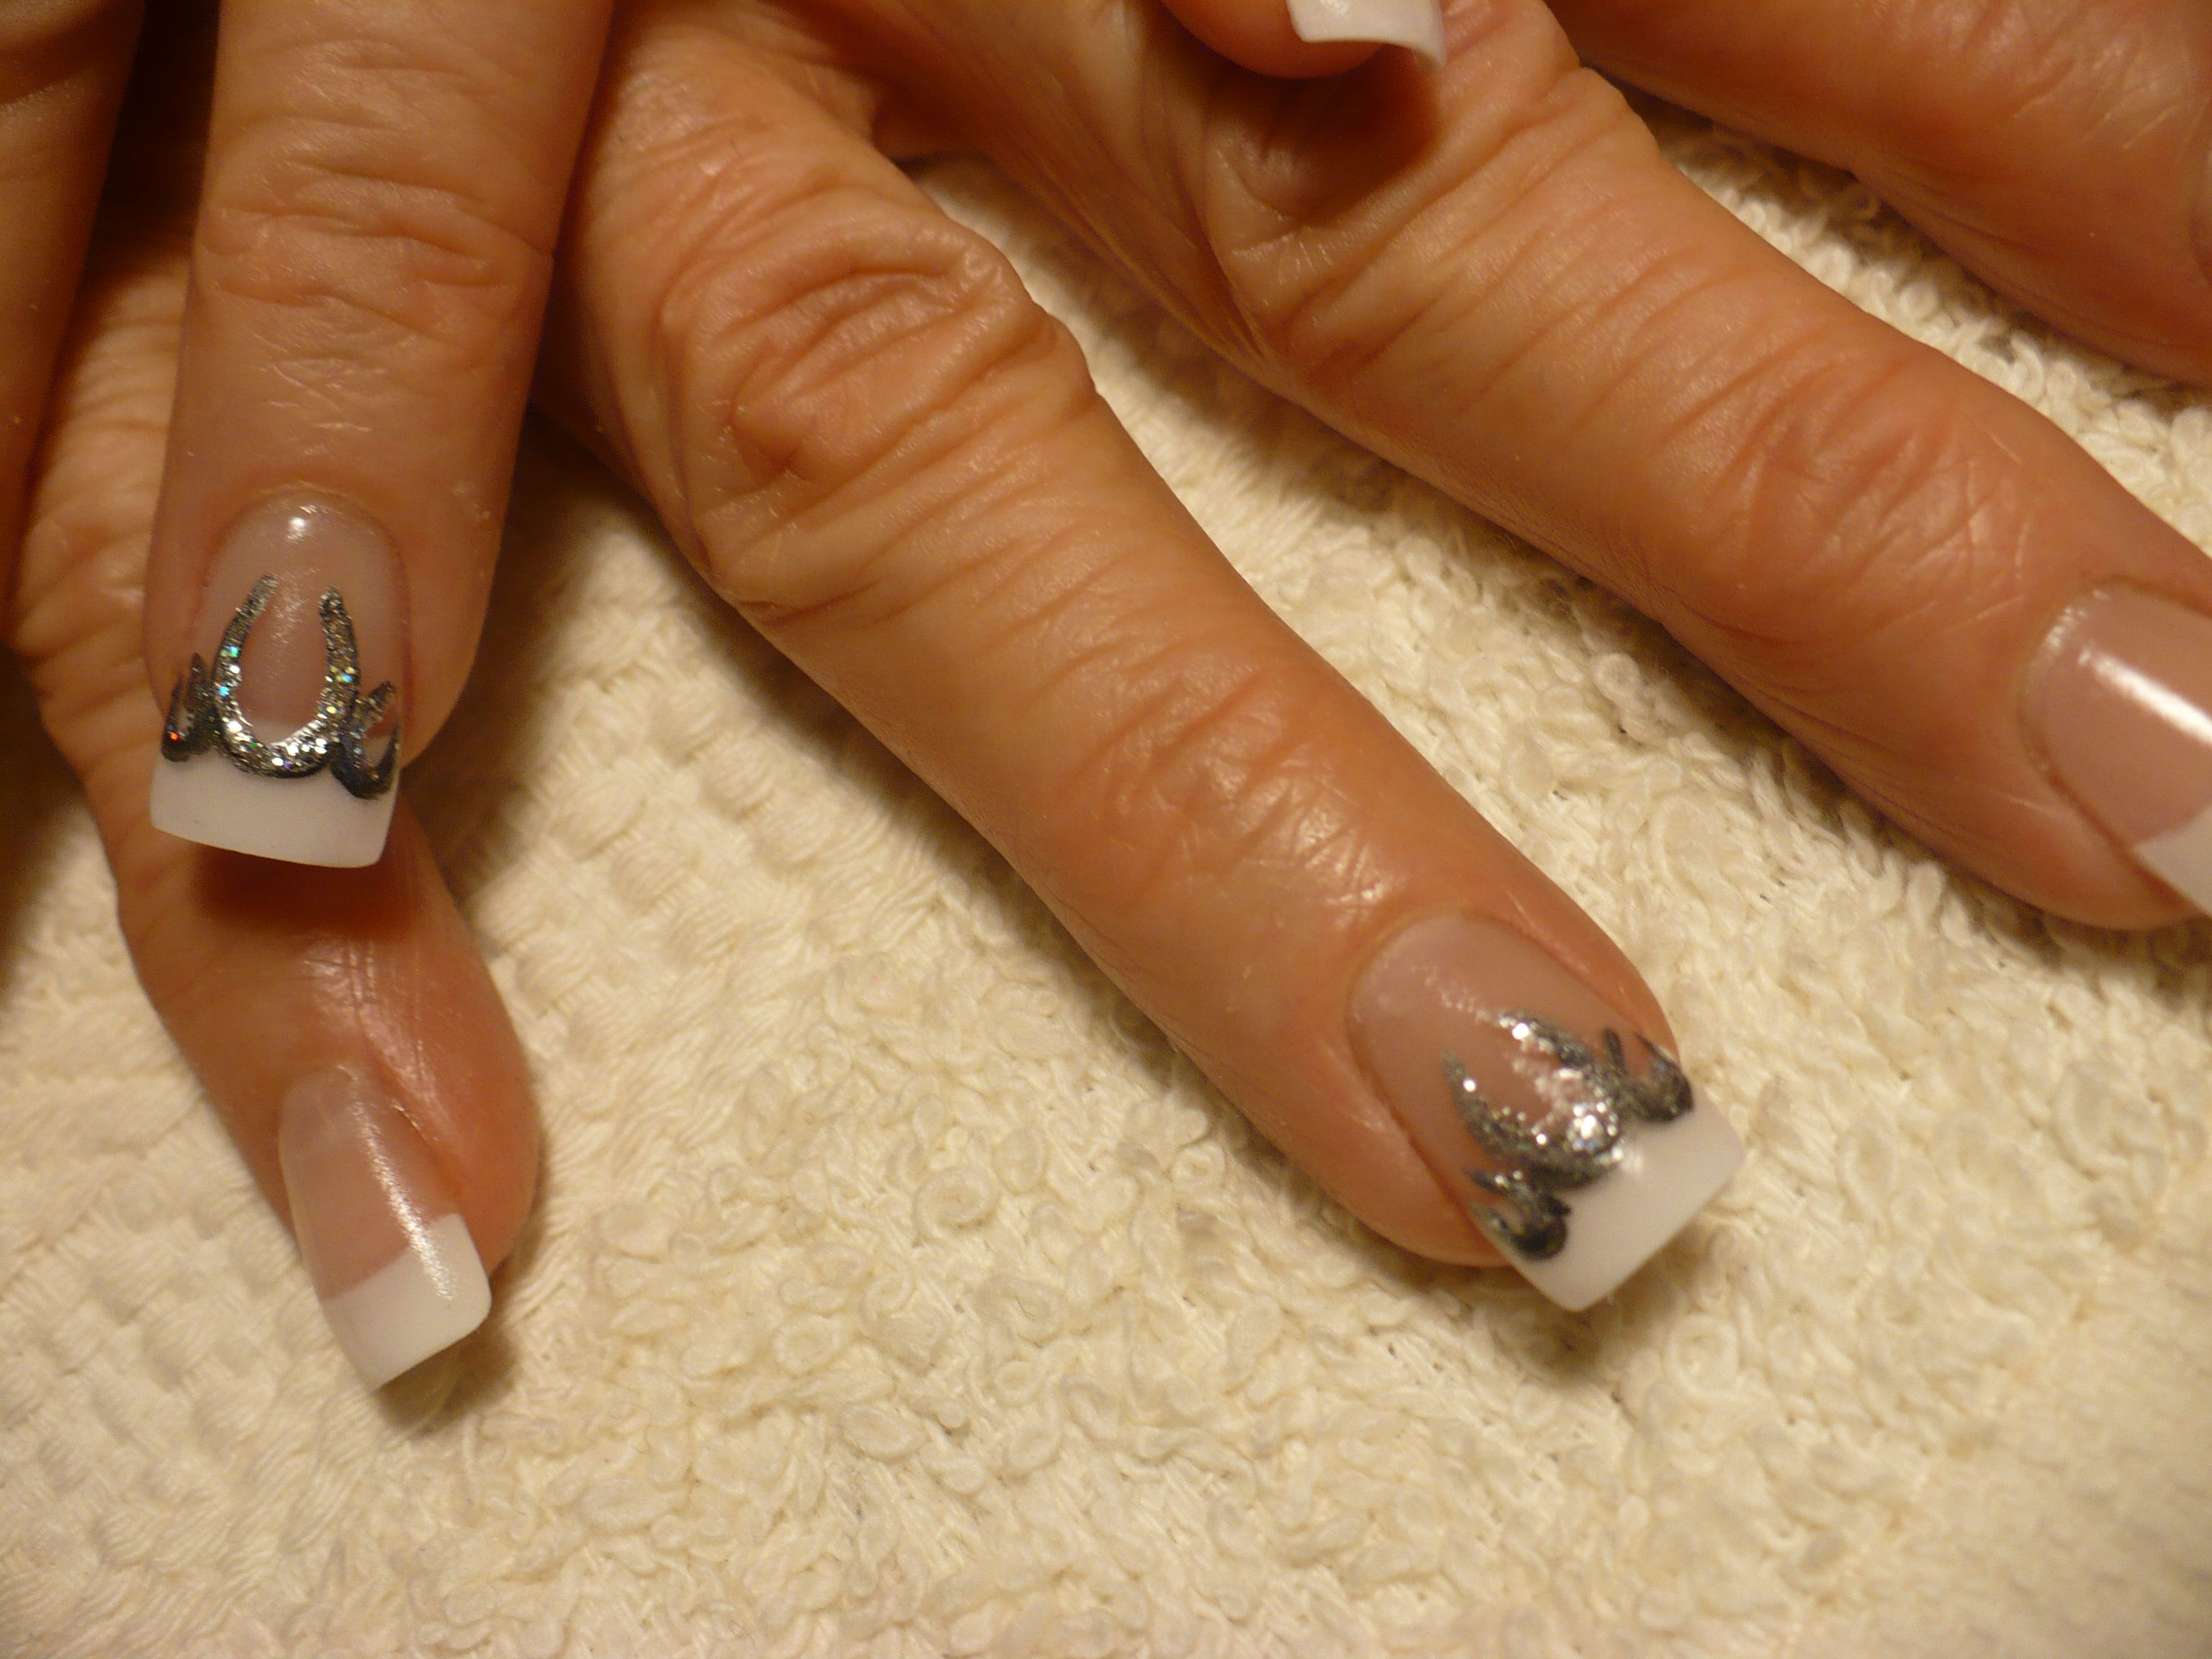 Horseshoe nail art. | Nails | Pinterest | Horseshoe nail art, Horse ...